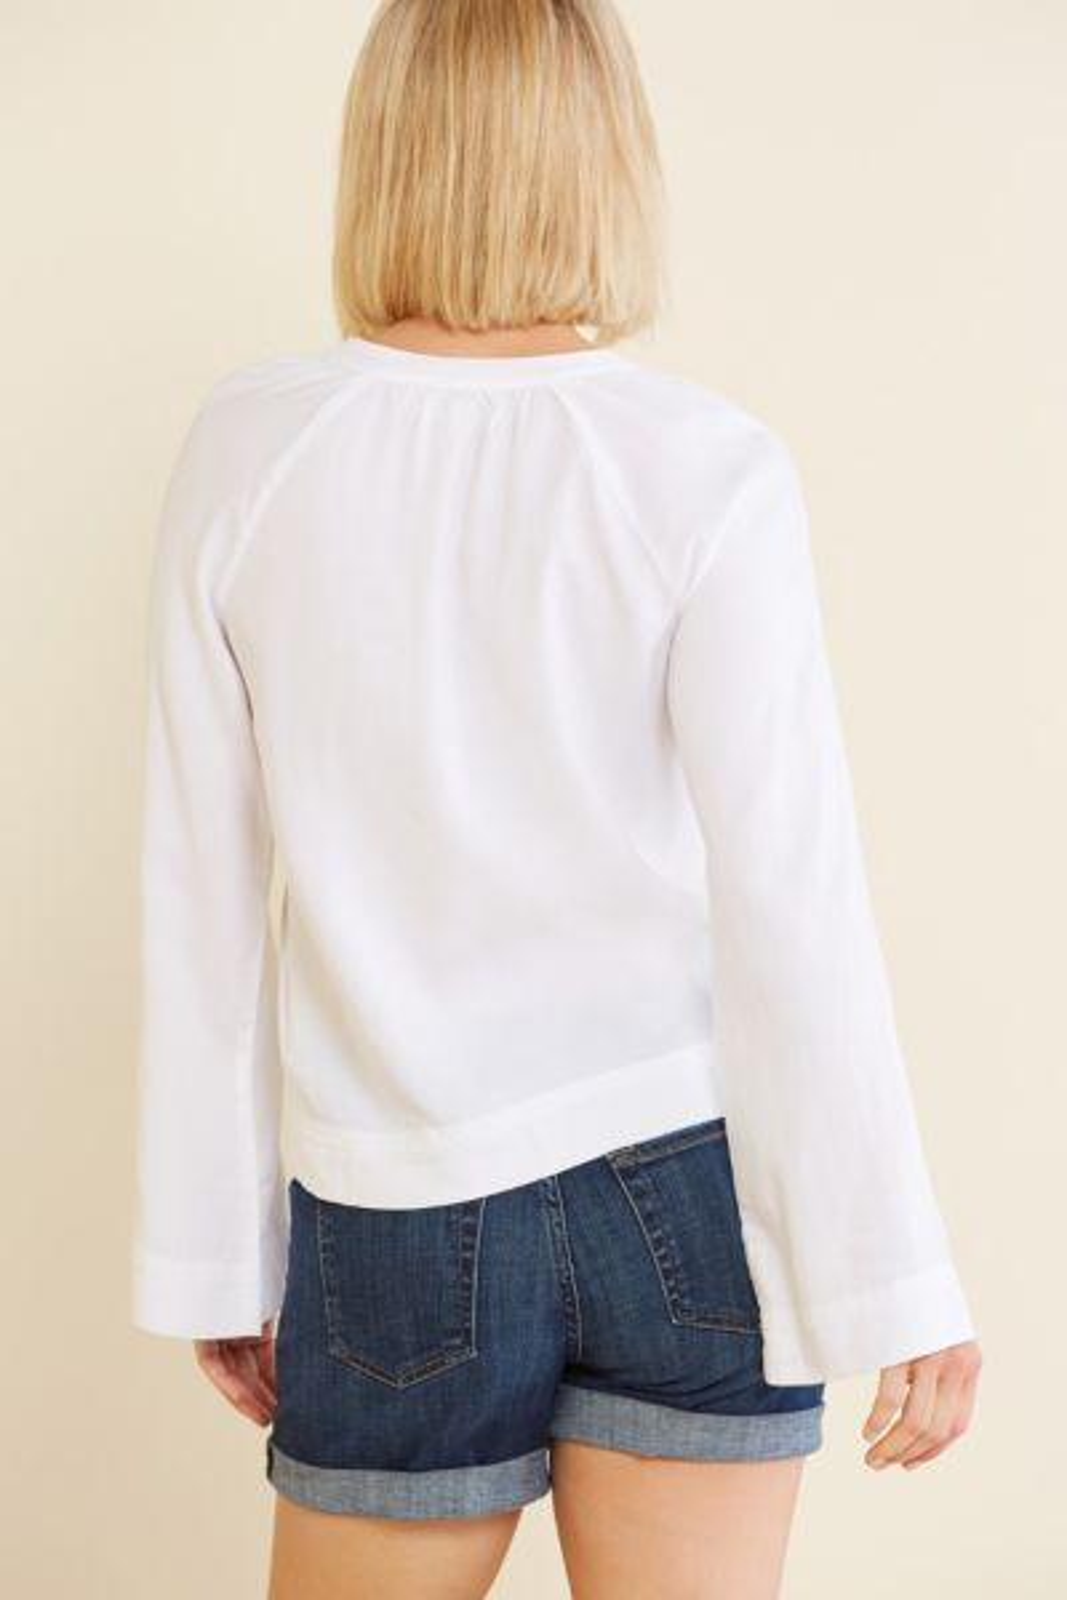 Cloth and stone Split Neck Raglan Top